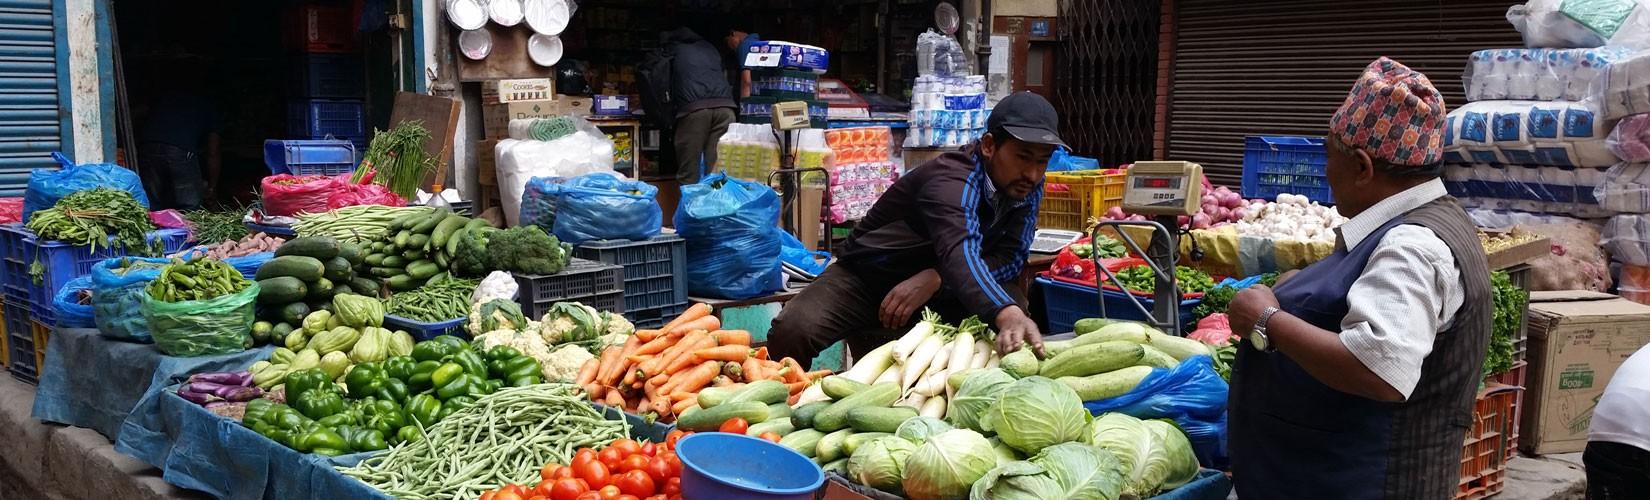 Old market tour of Kathmandu